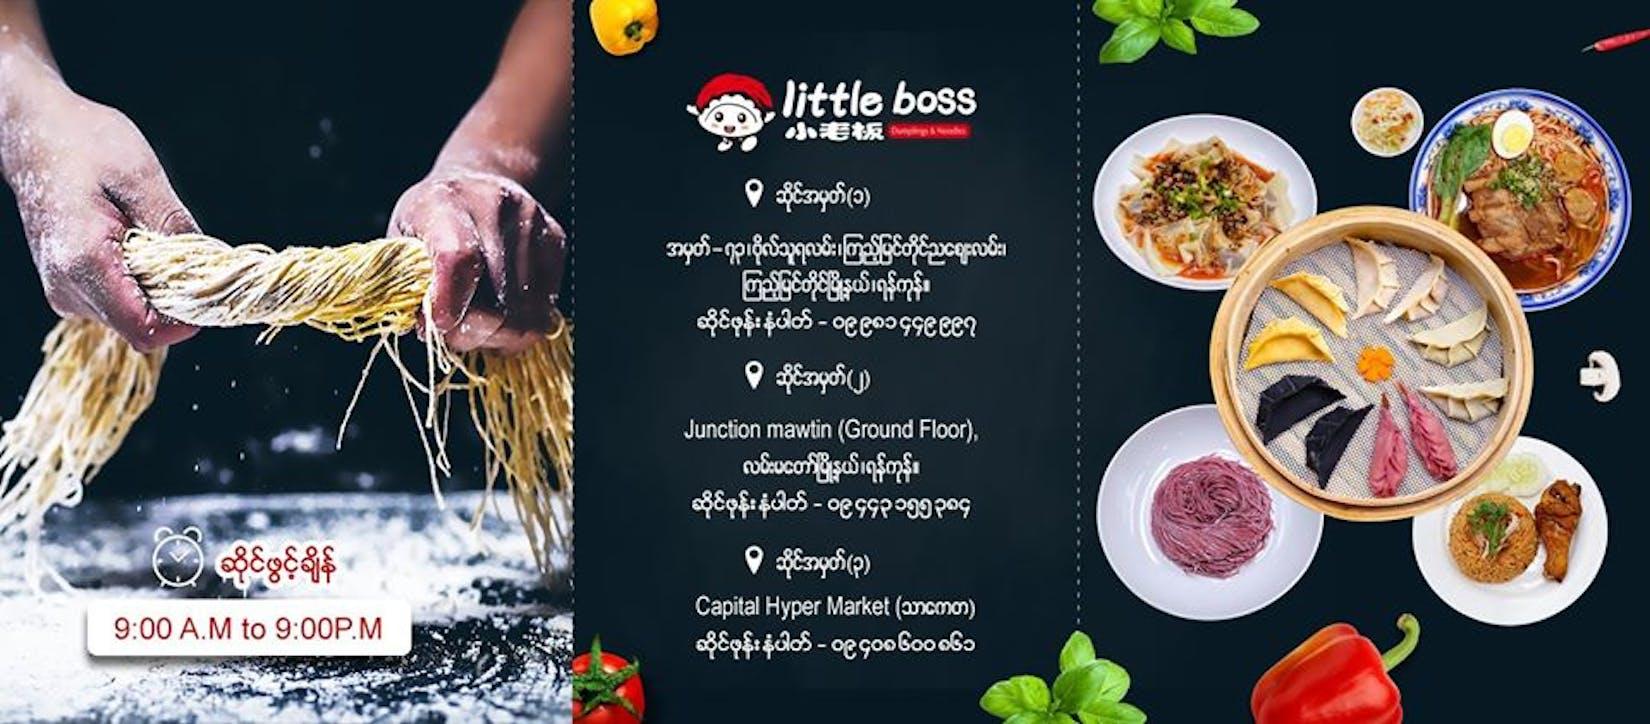 Little Boss Dumpling & Noodle (Thaketa Capital branch) | yathar